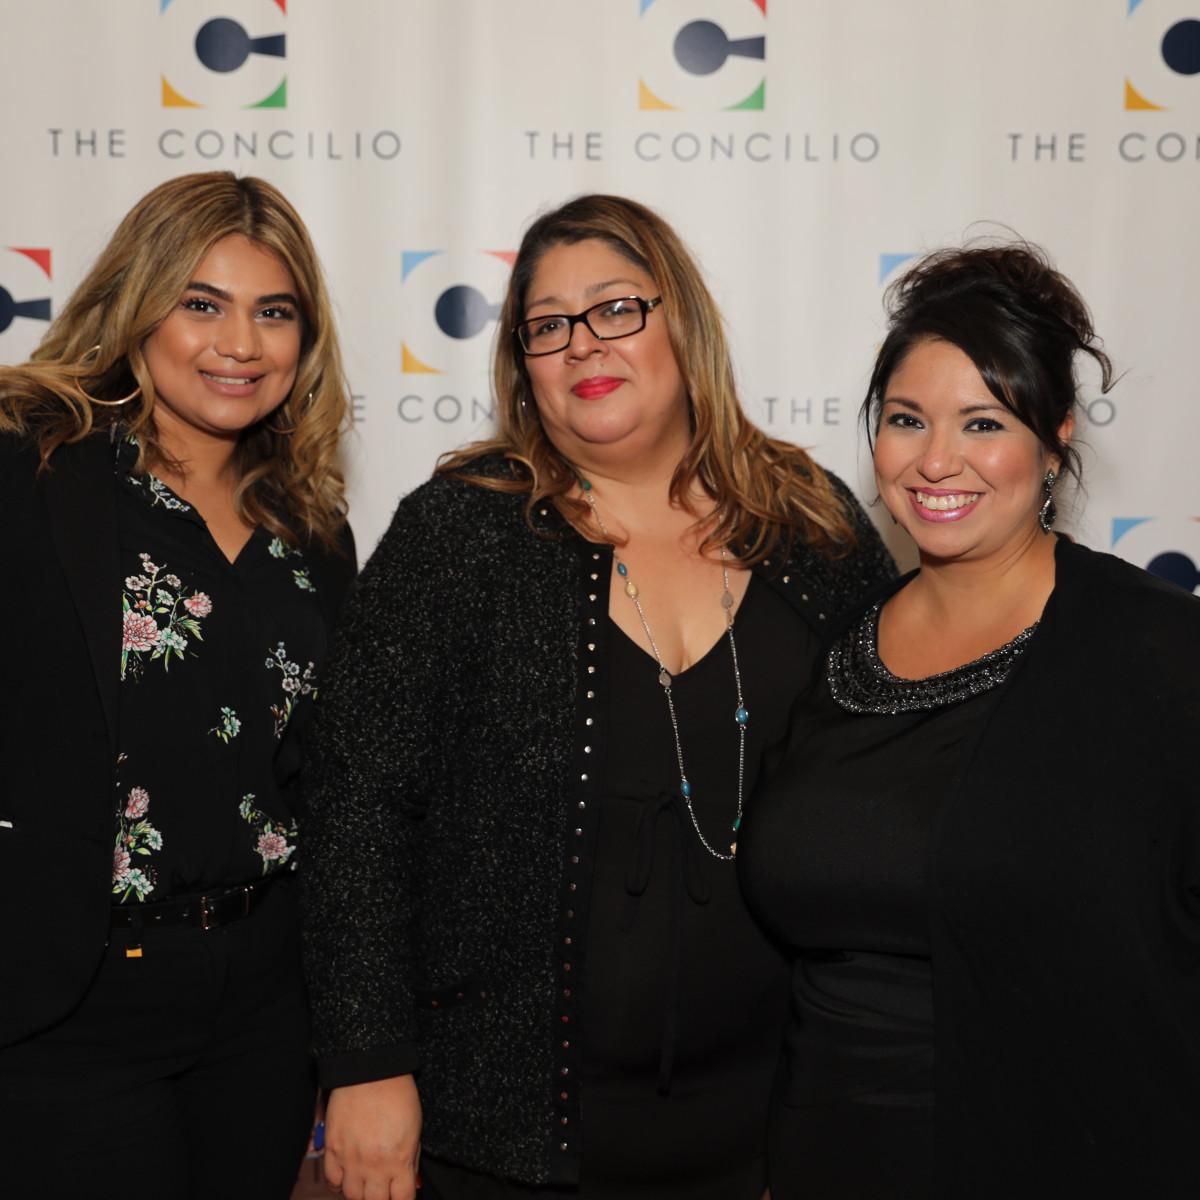 Elizabeth Guerra, Angelina Mireles, Cynthie Paschall